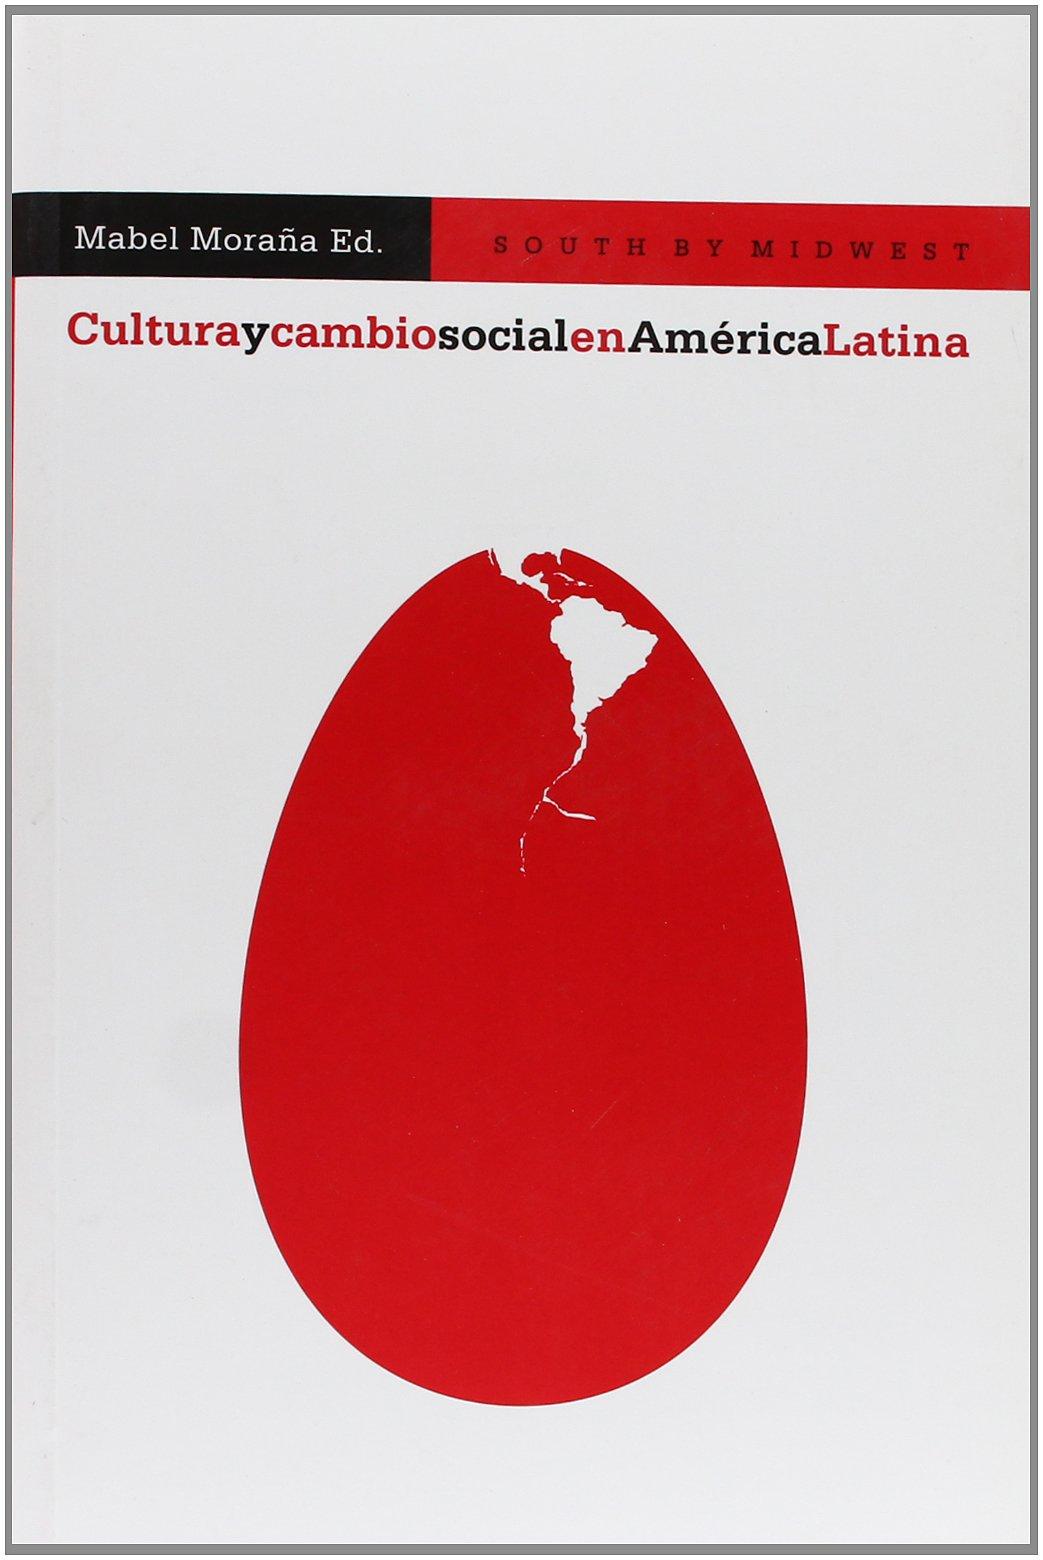 como es la cultura de america latina